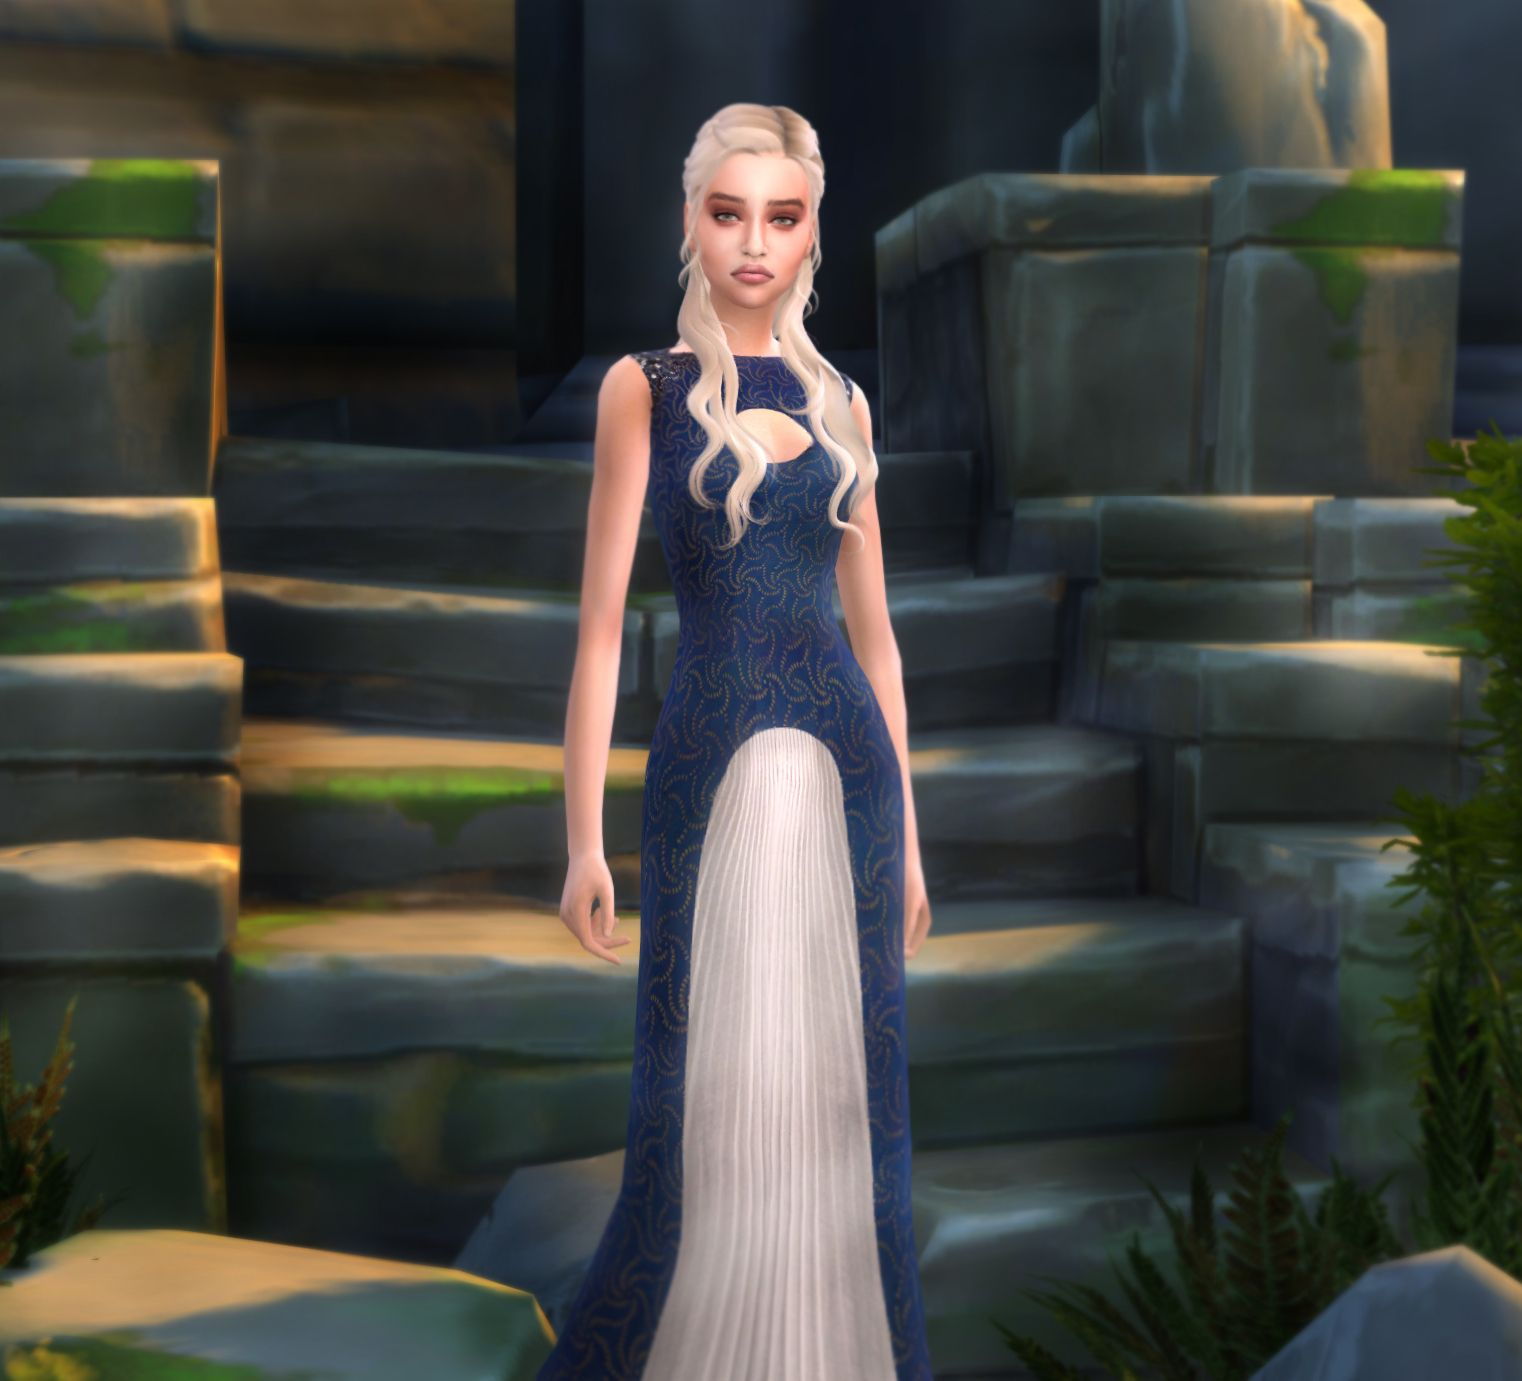 Daenerys Targaryen Sims 4. Daenerys Makeup And Dress By